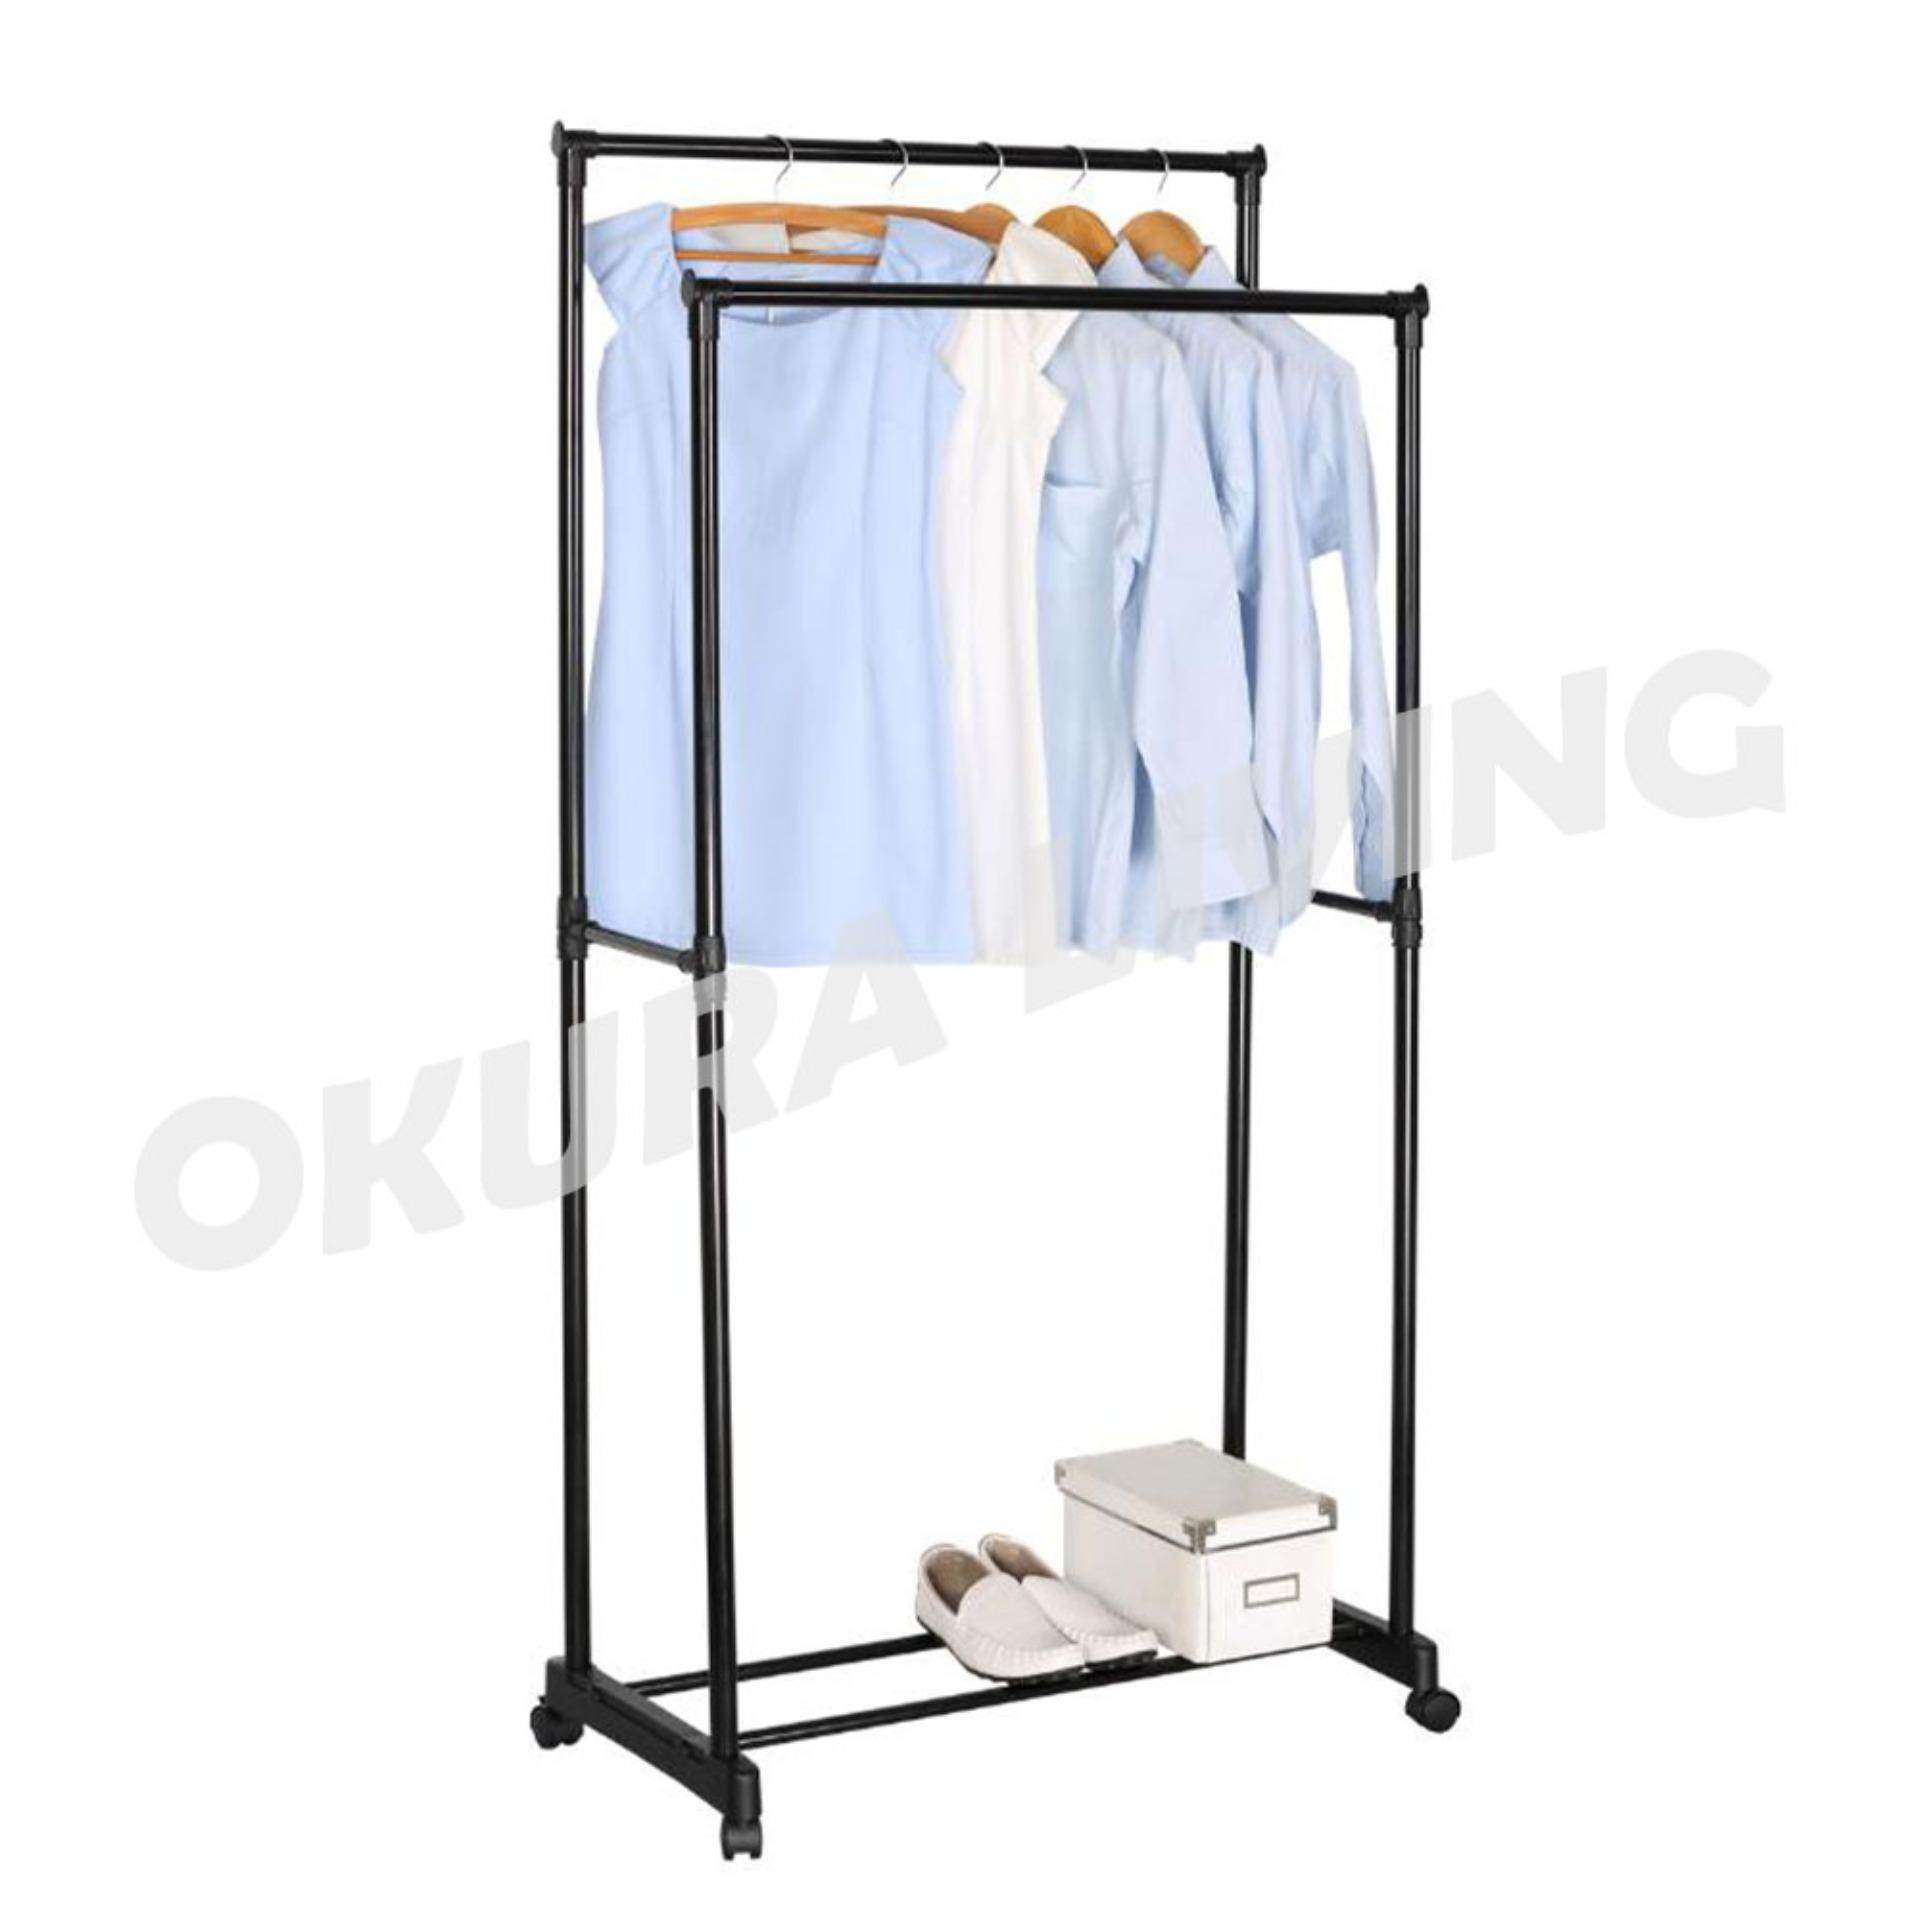 OKURA Double Garment Cloth Hanger and Shoe Rack Powder Coated